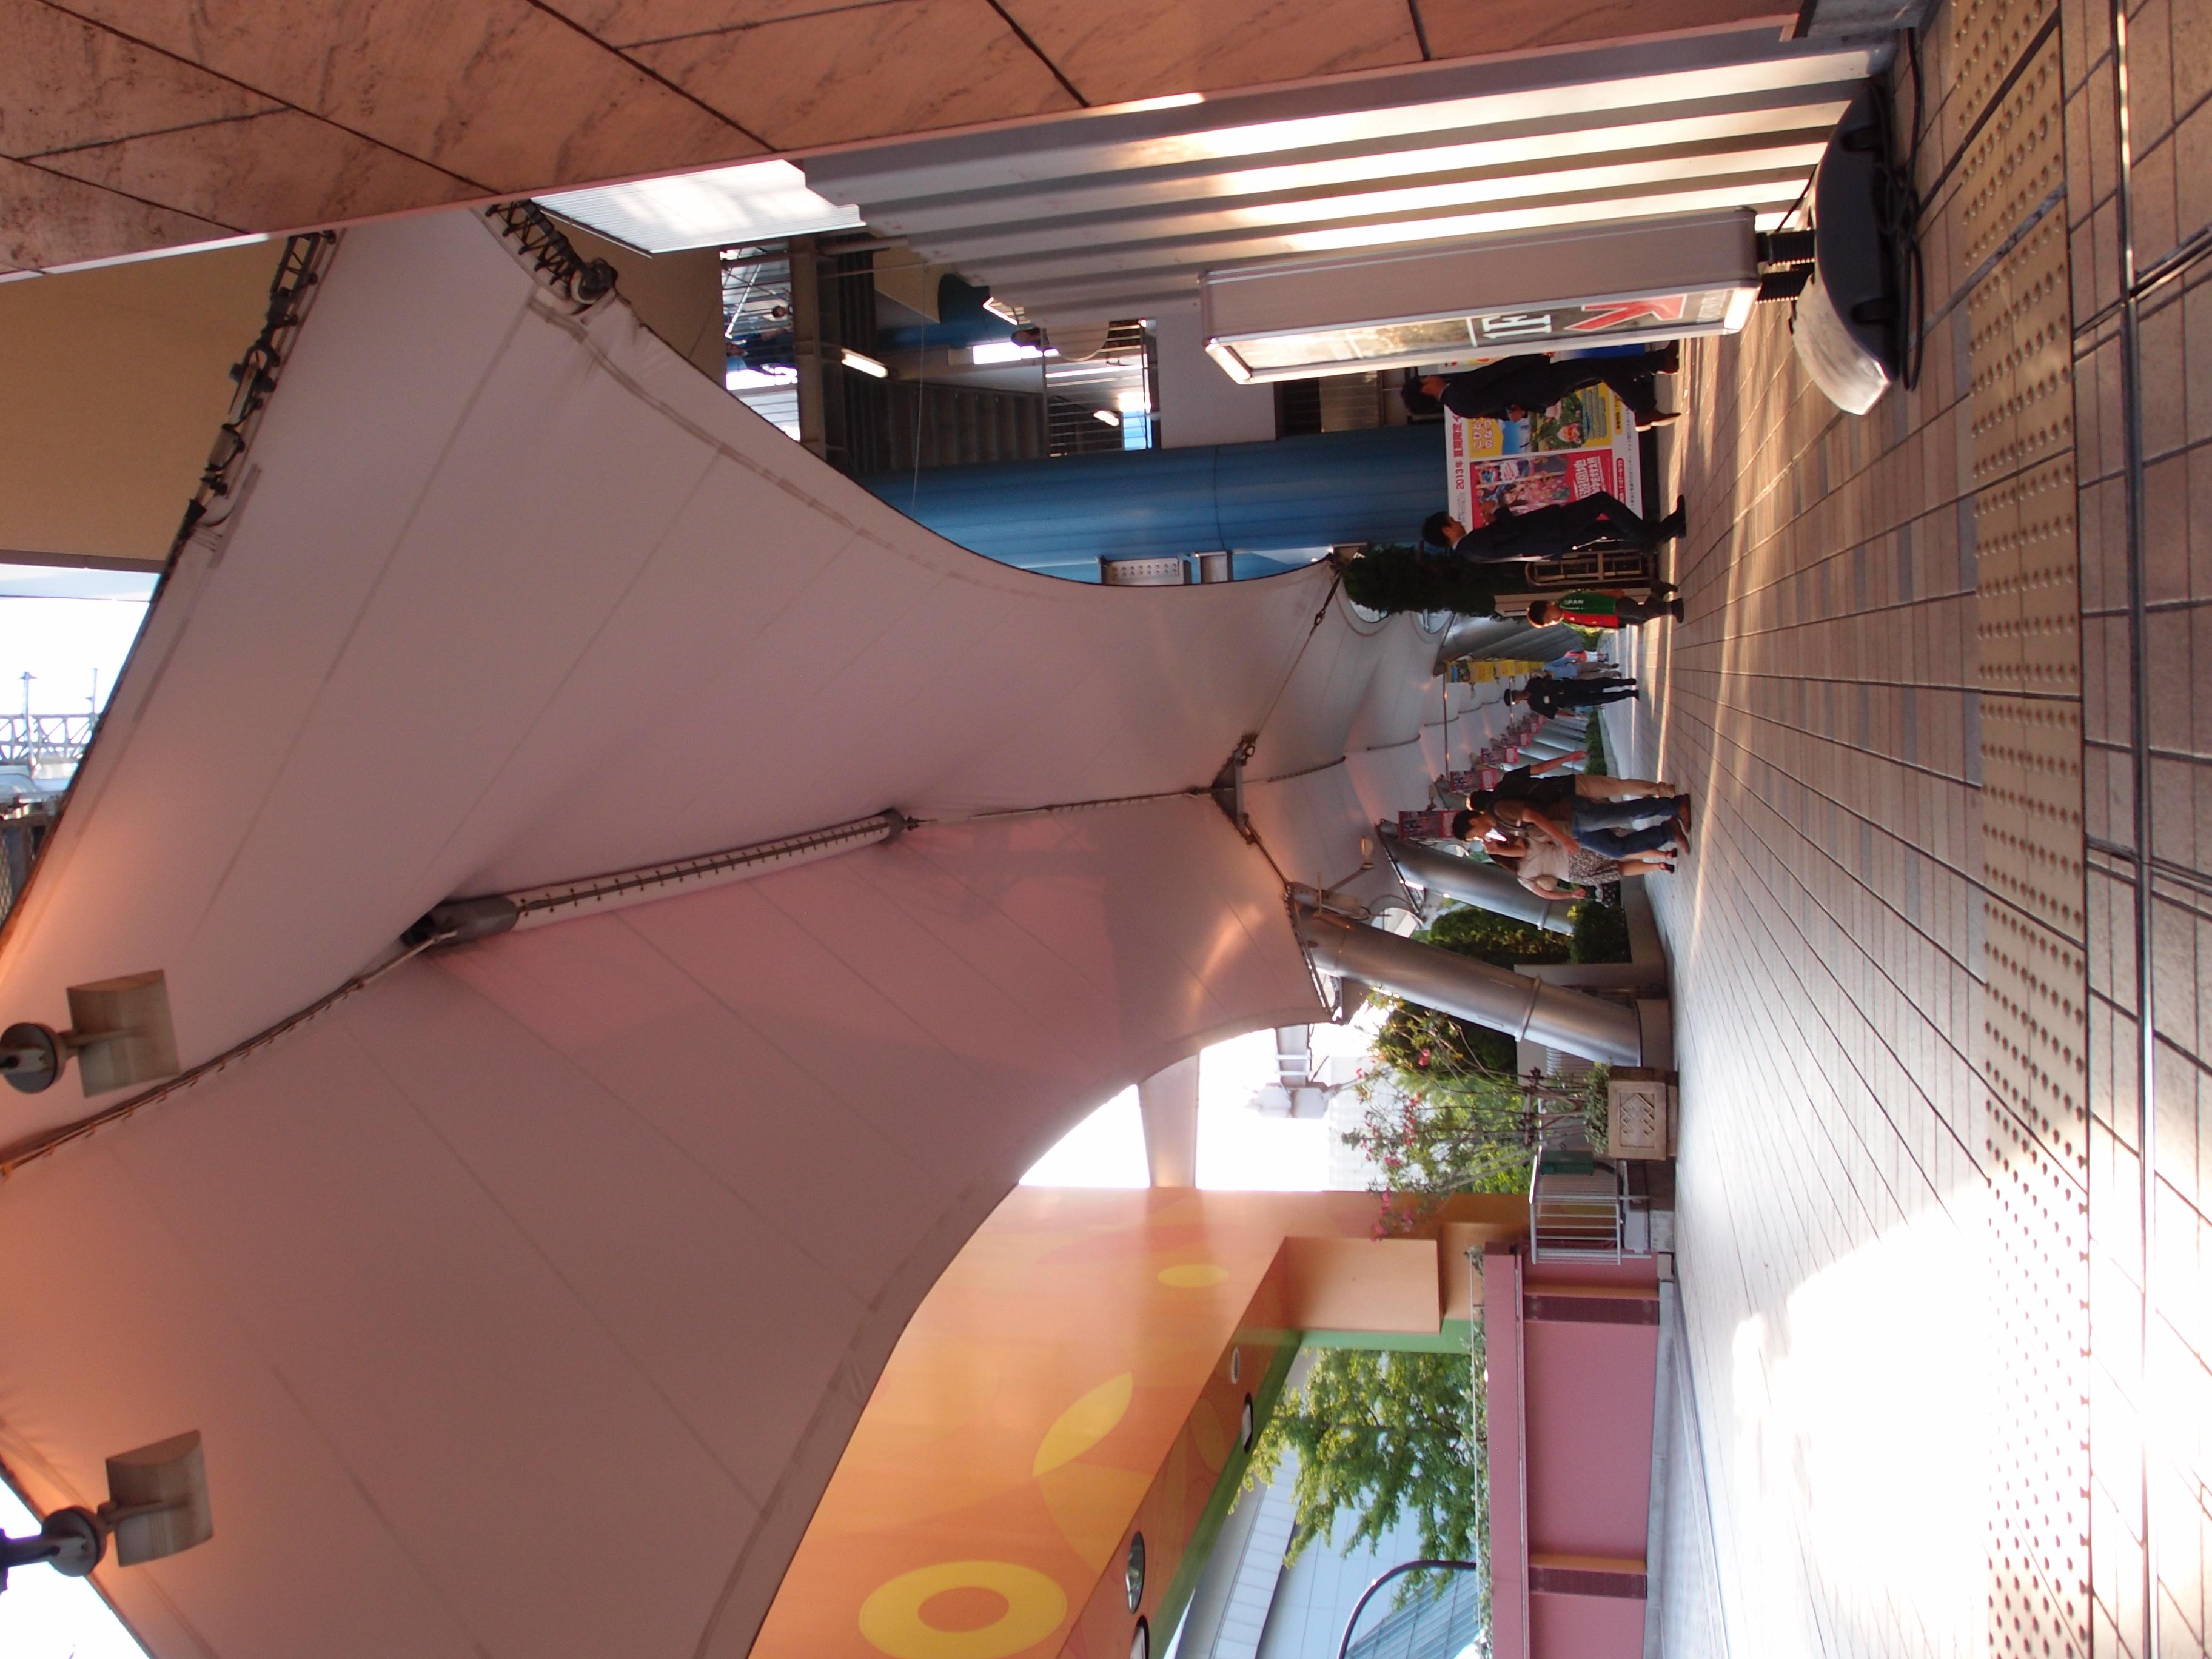 Sun City Mall